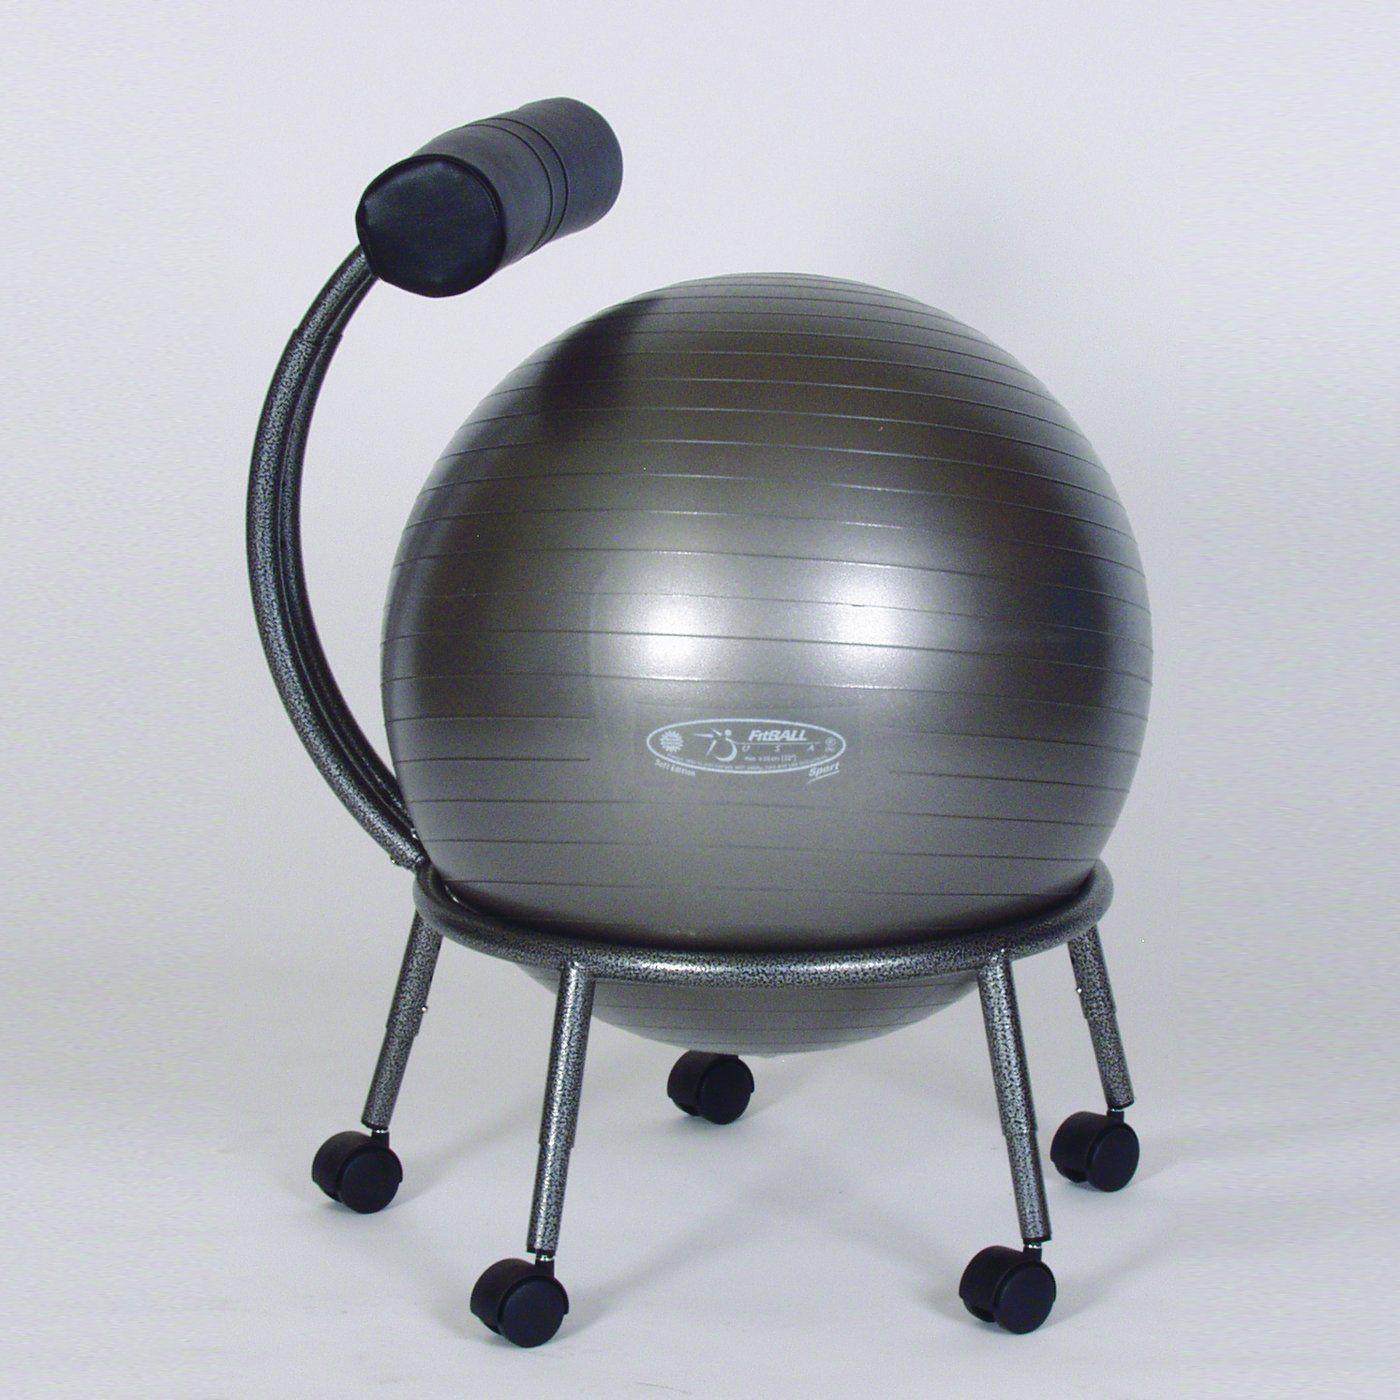 FitBall Stability Ball Chair  Balance Ball Chair  I want